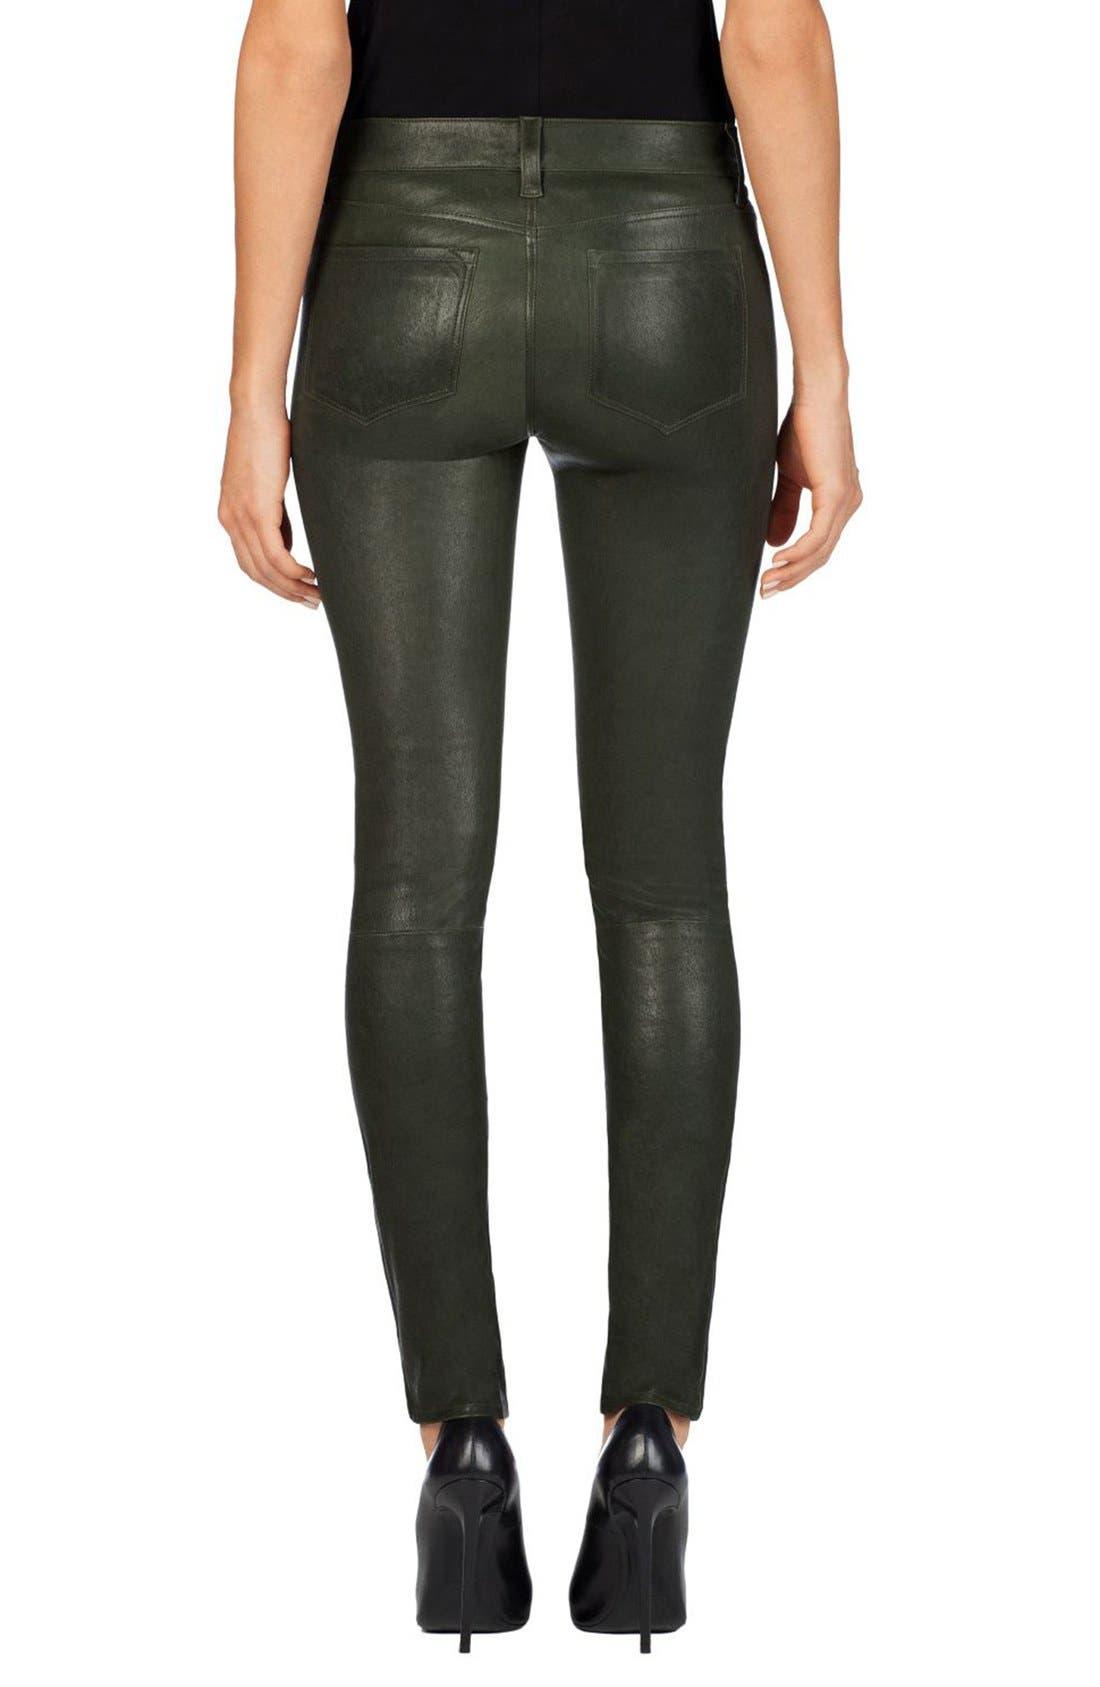 '8001' Lambskin Leather Pants,                             Alternate thumbnail 35, color,